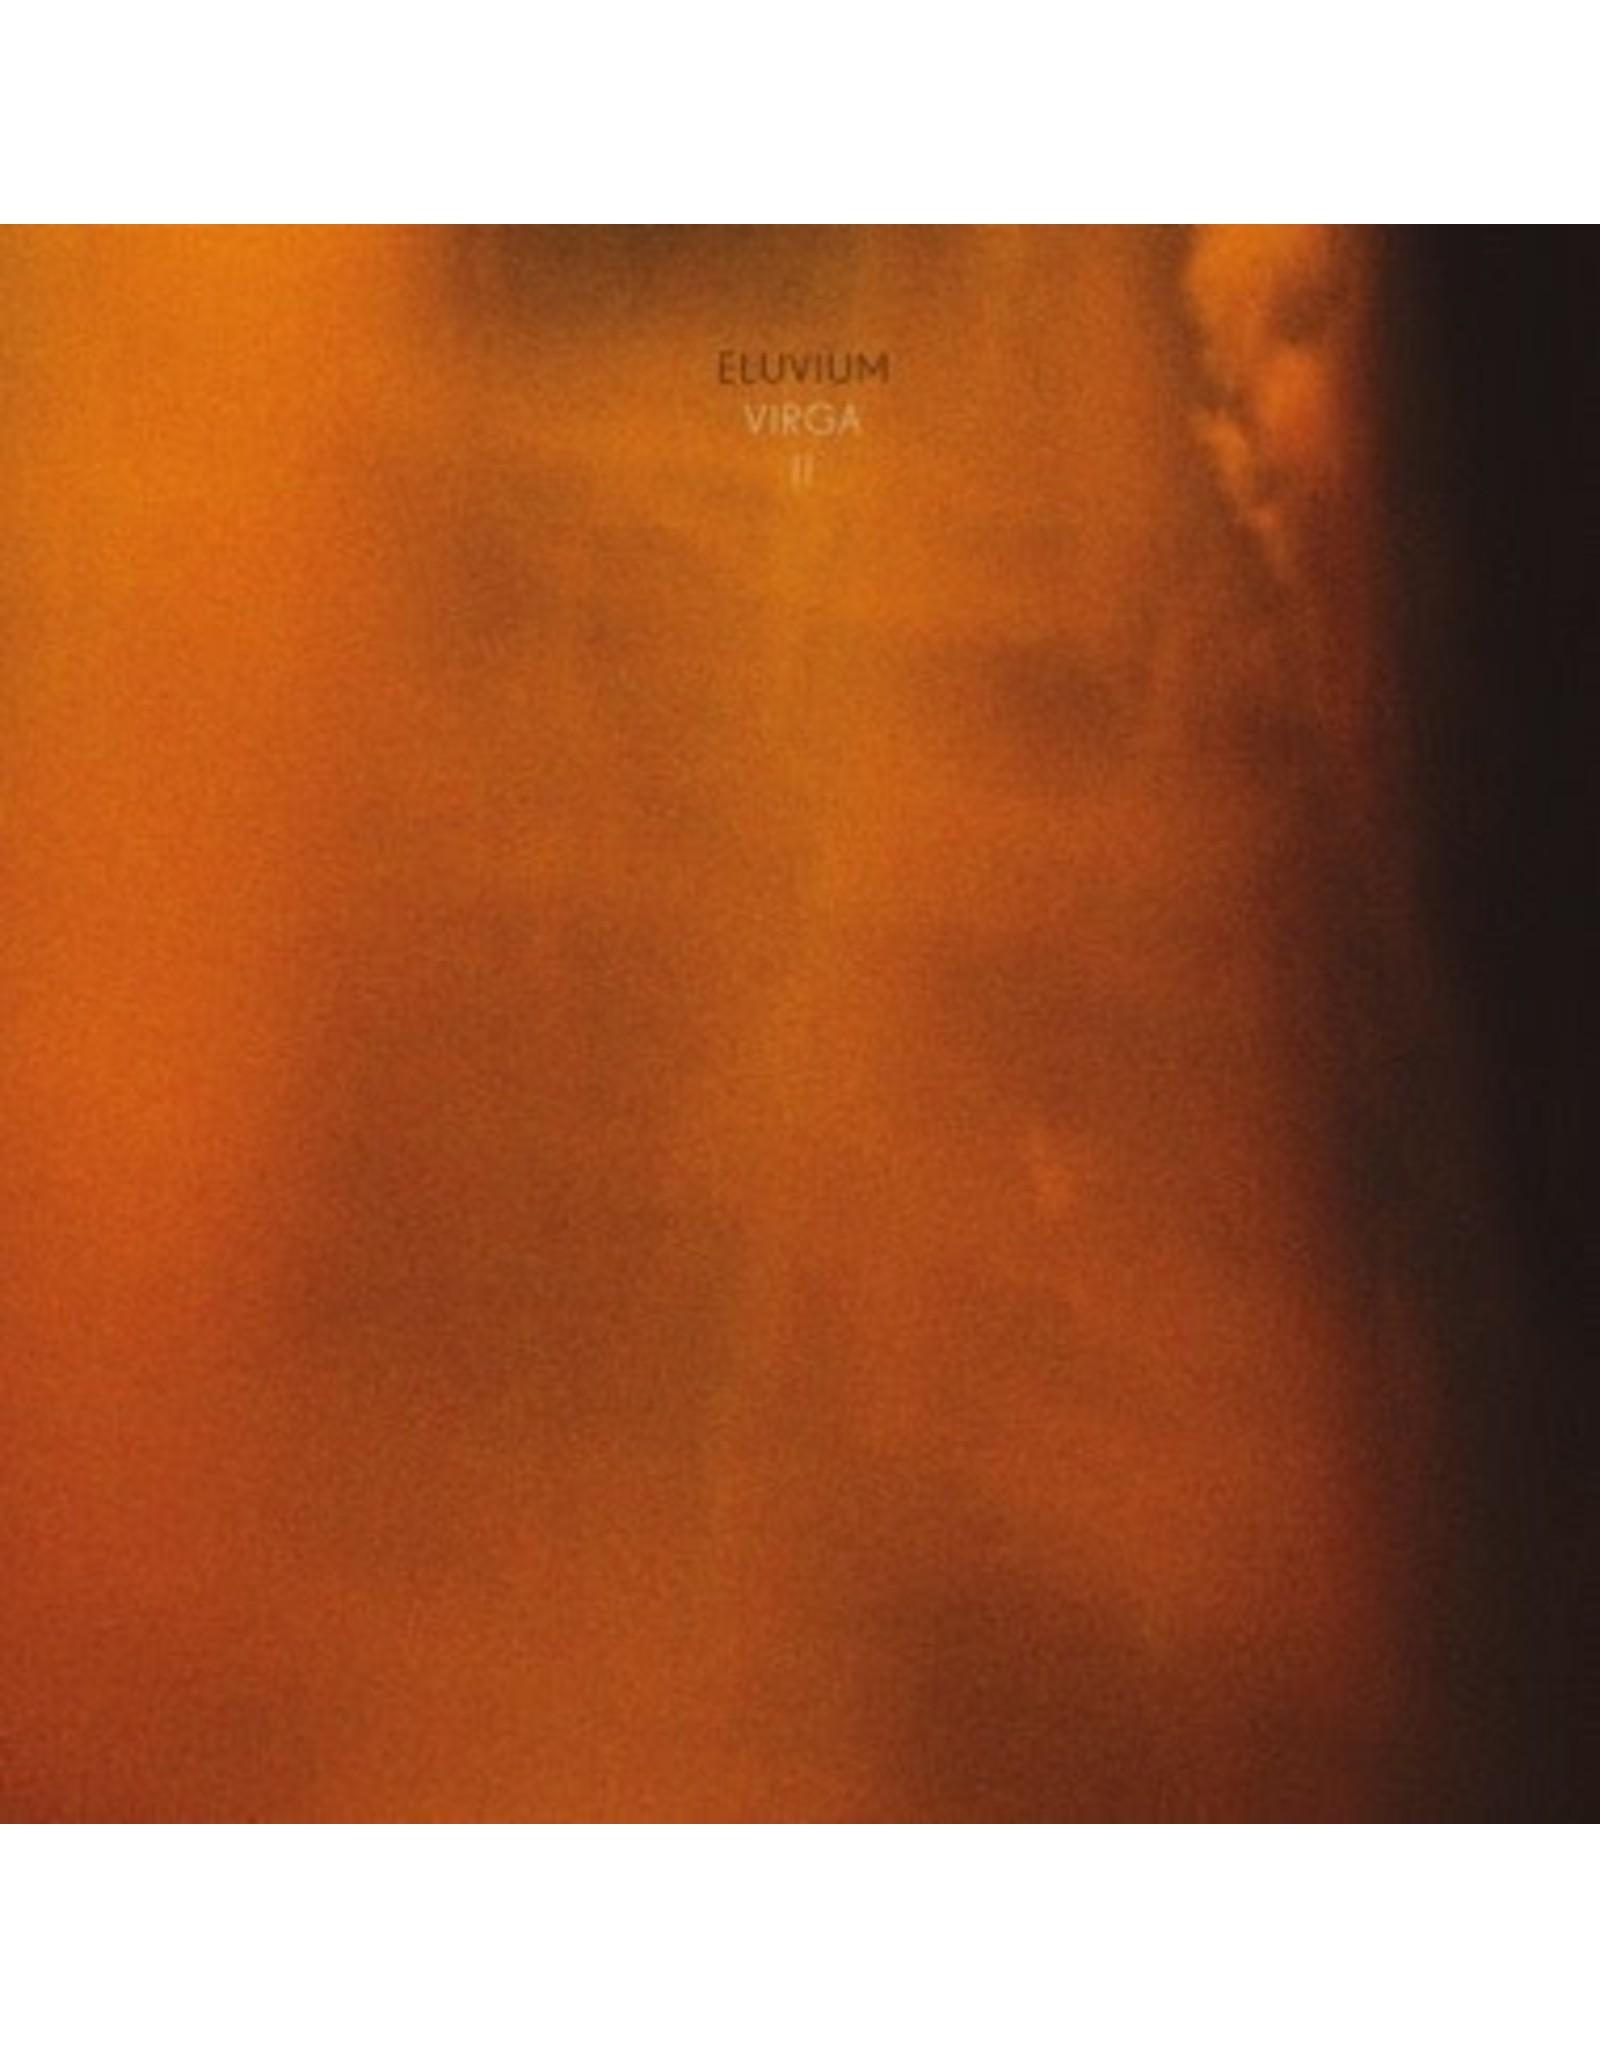 New Vinyl Eluvium - Virga II (Clear) LP